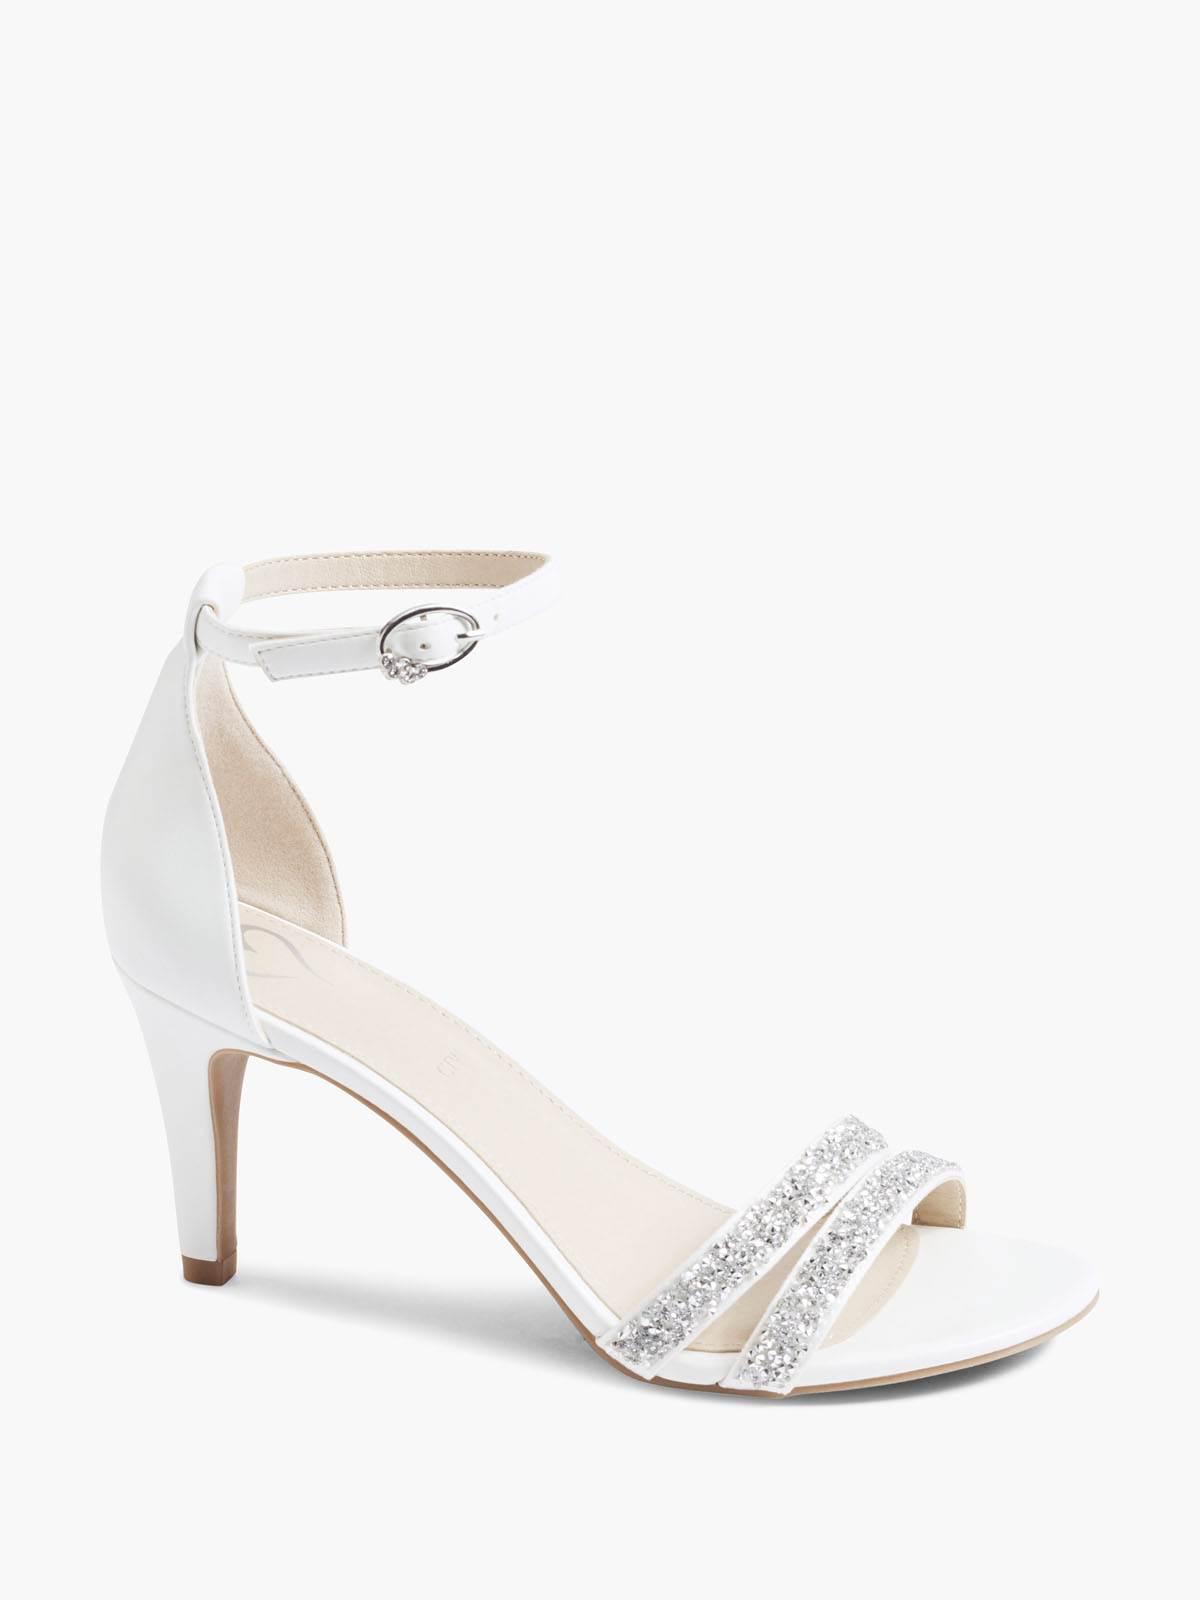 Cipele za vjenčanje, Deichmann